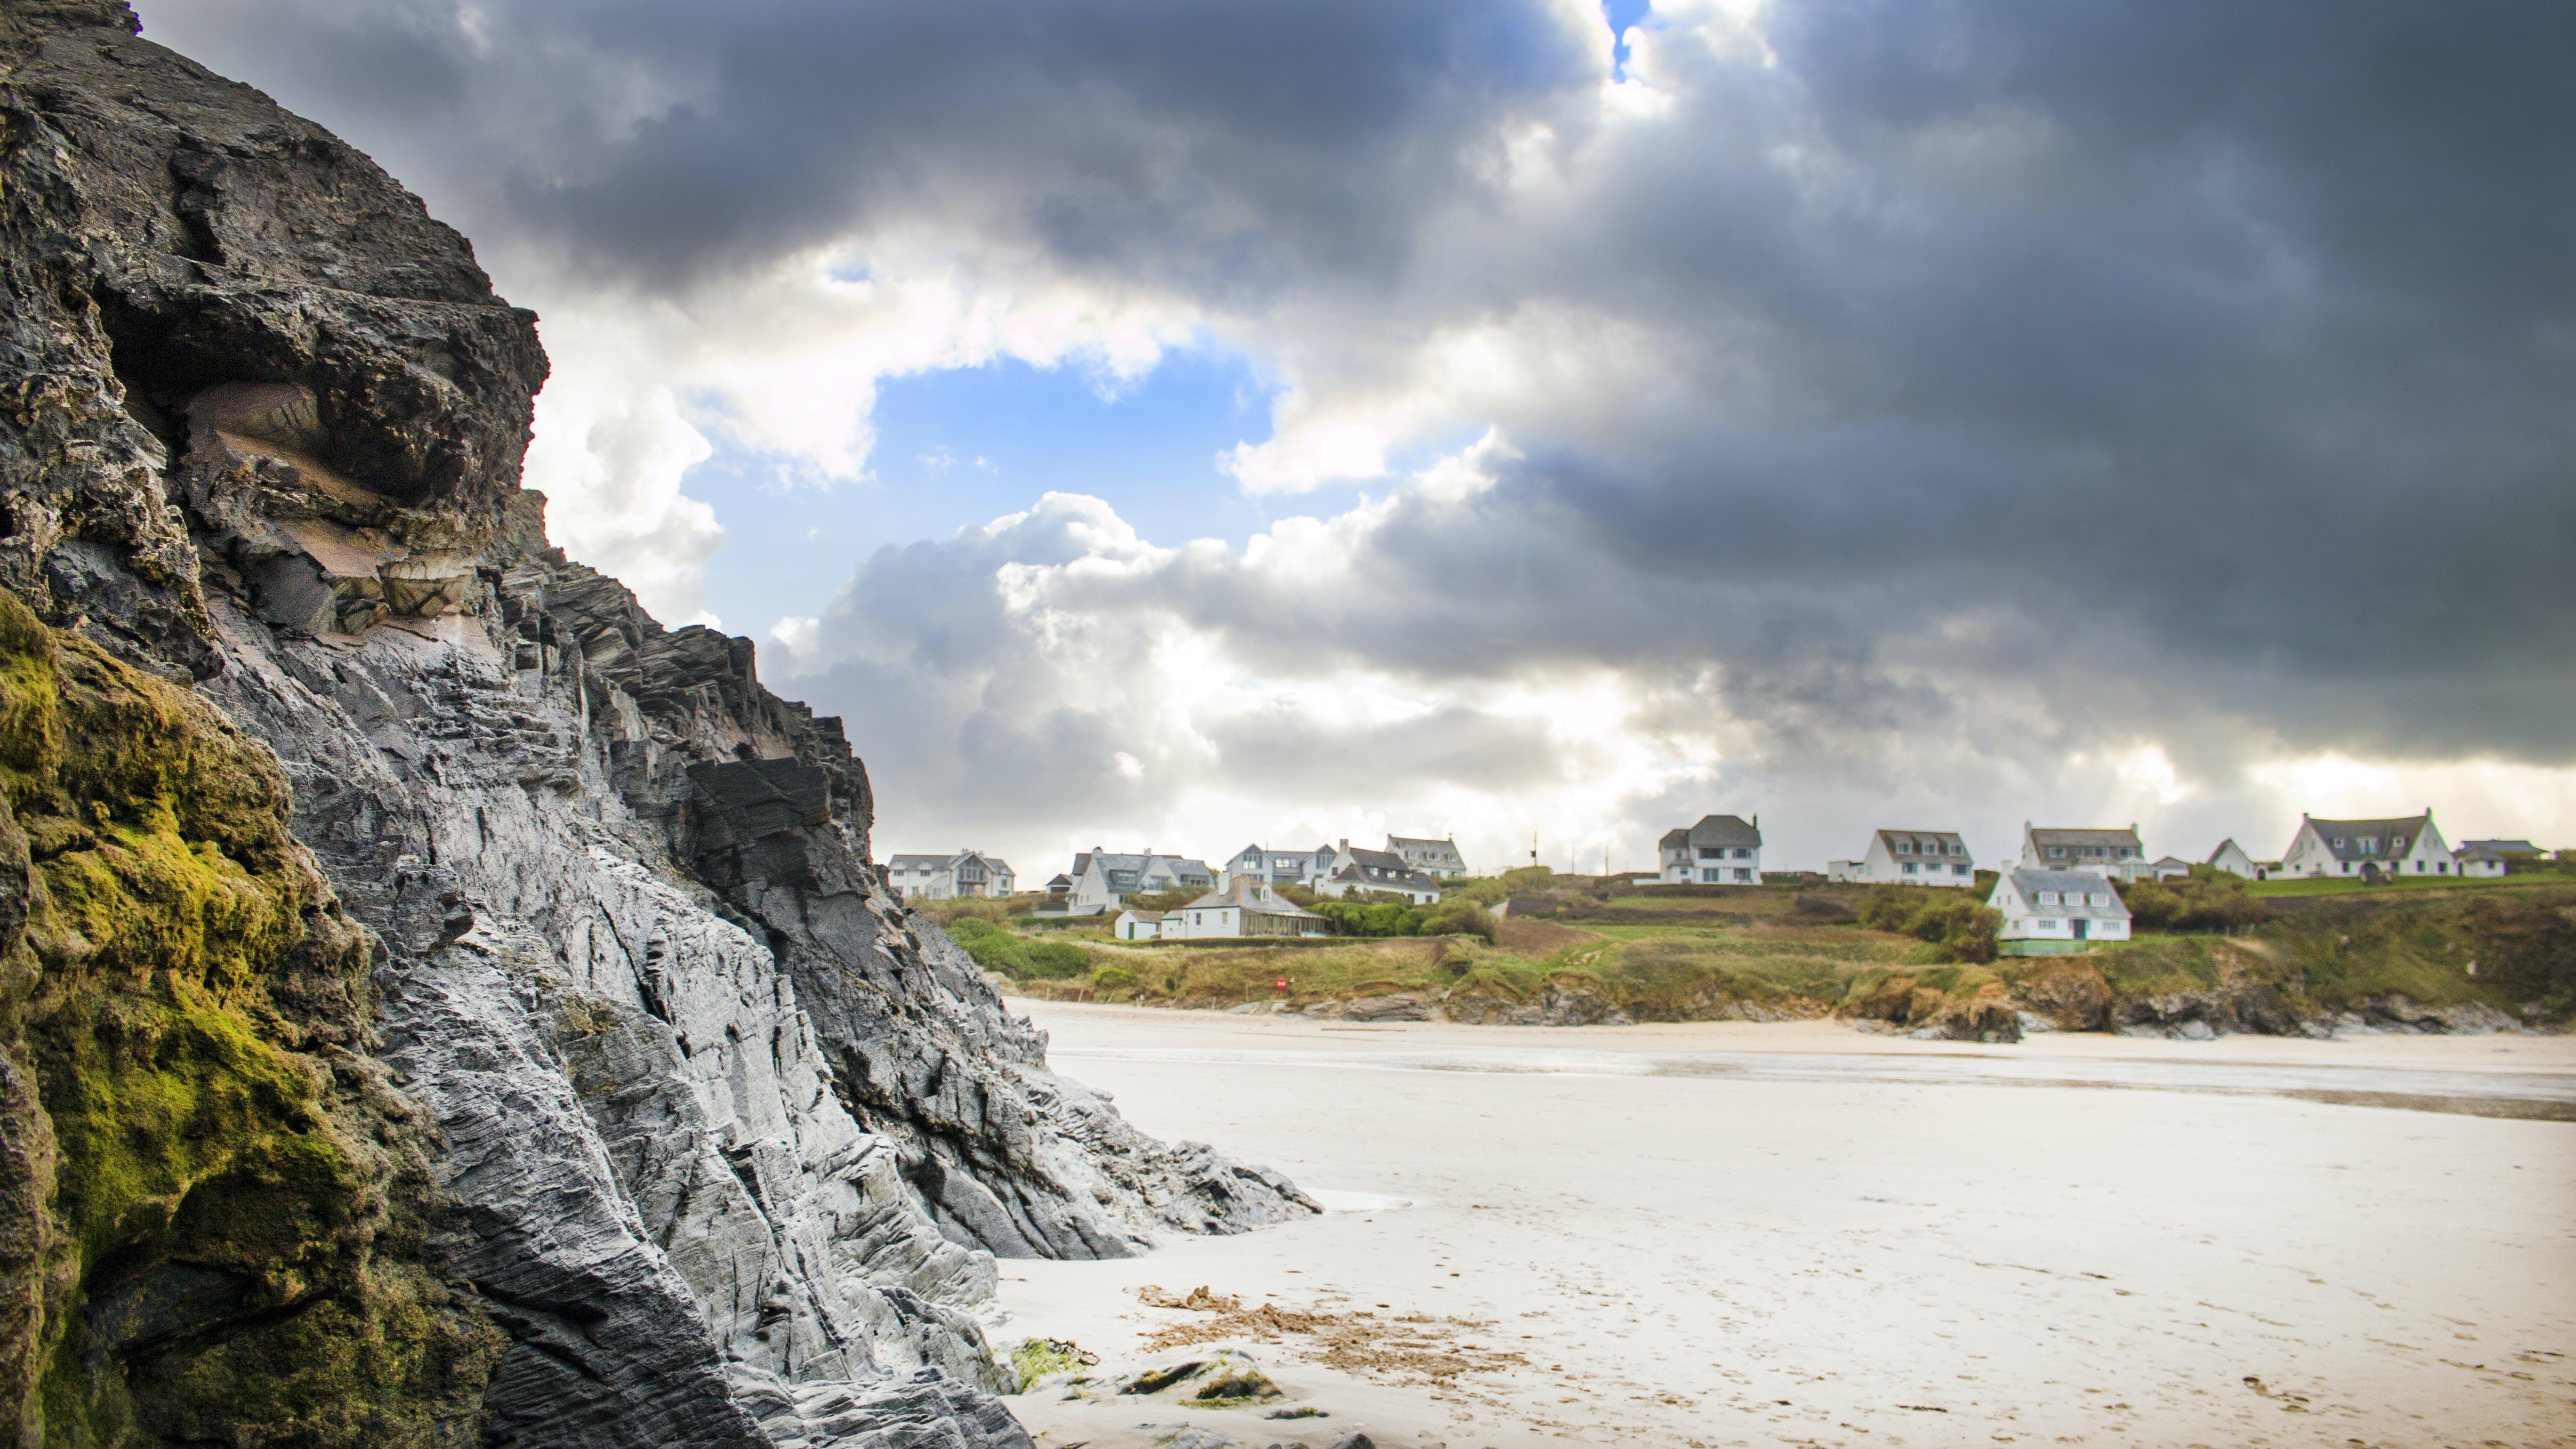 White Sand Beside Grey Rock Cliff